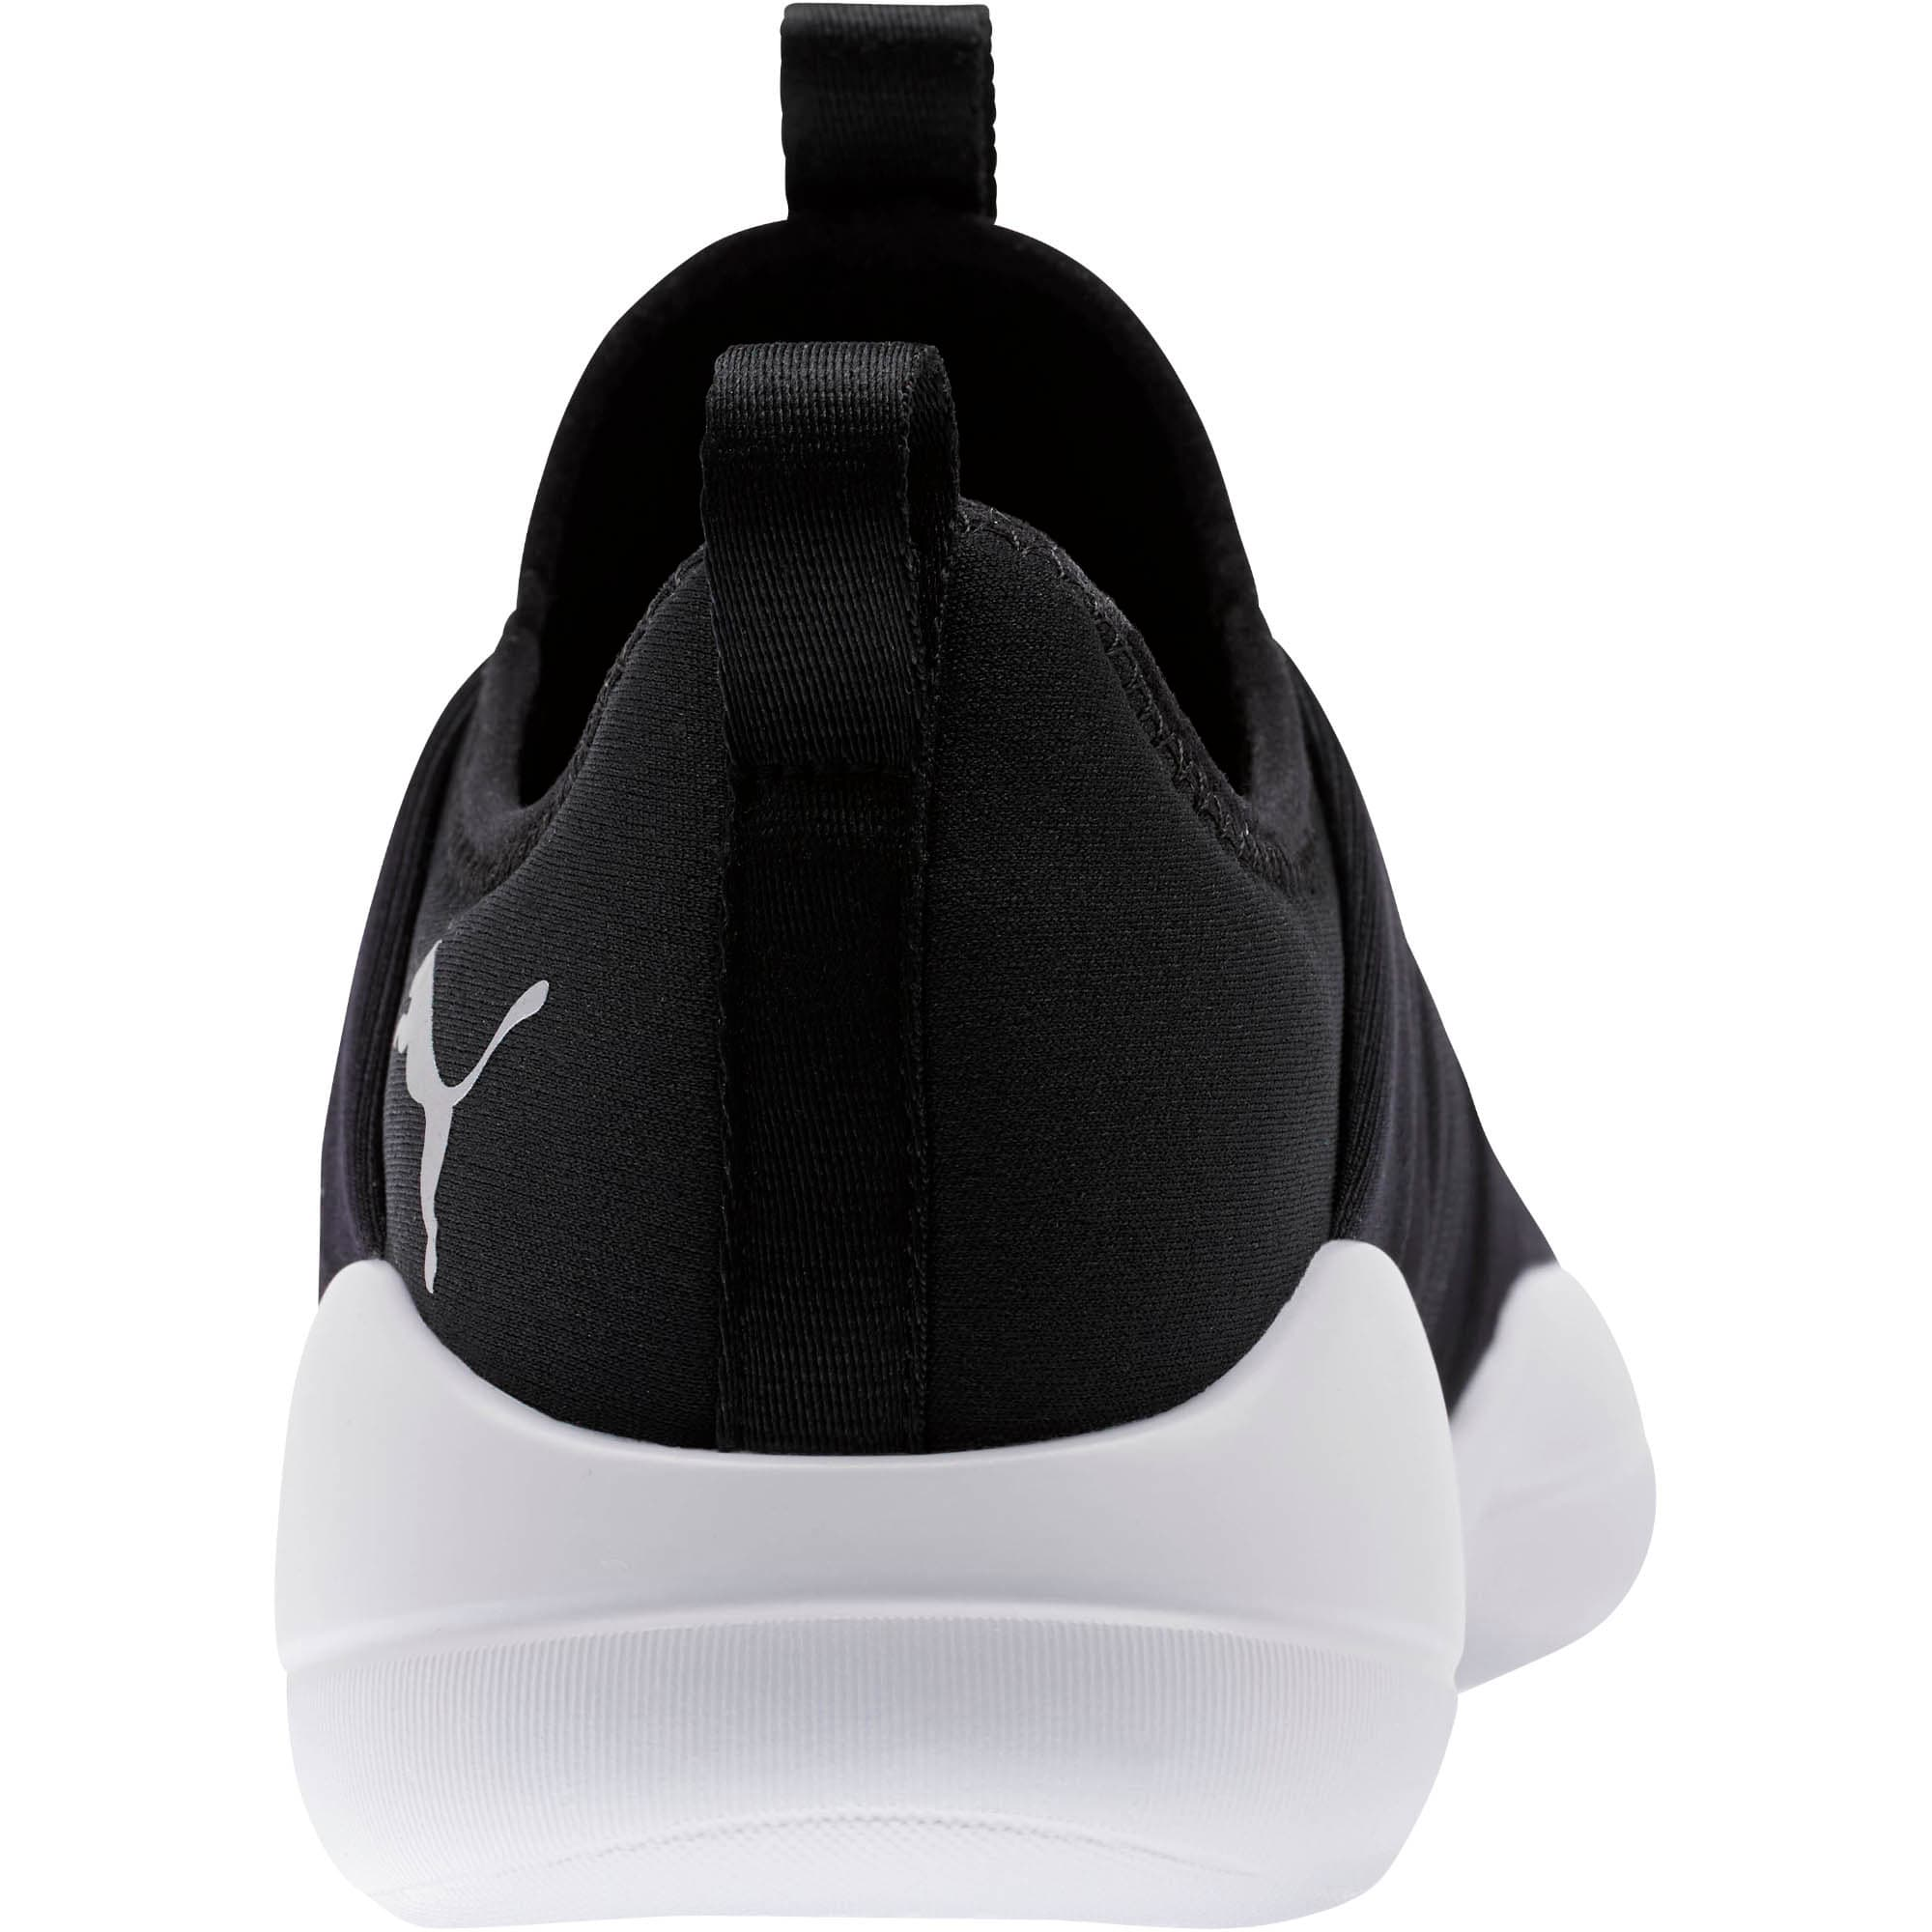 Thumbnail 3 of Flourish Stellar Women's Training Shoes, Puma Black-Puma White, medium